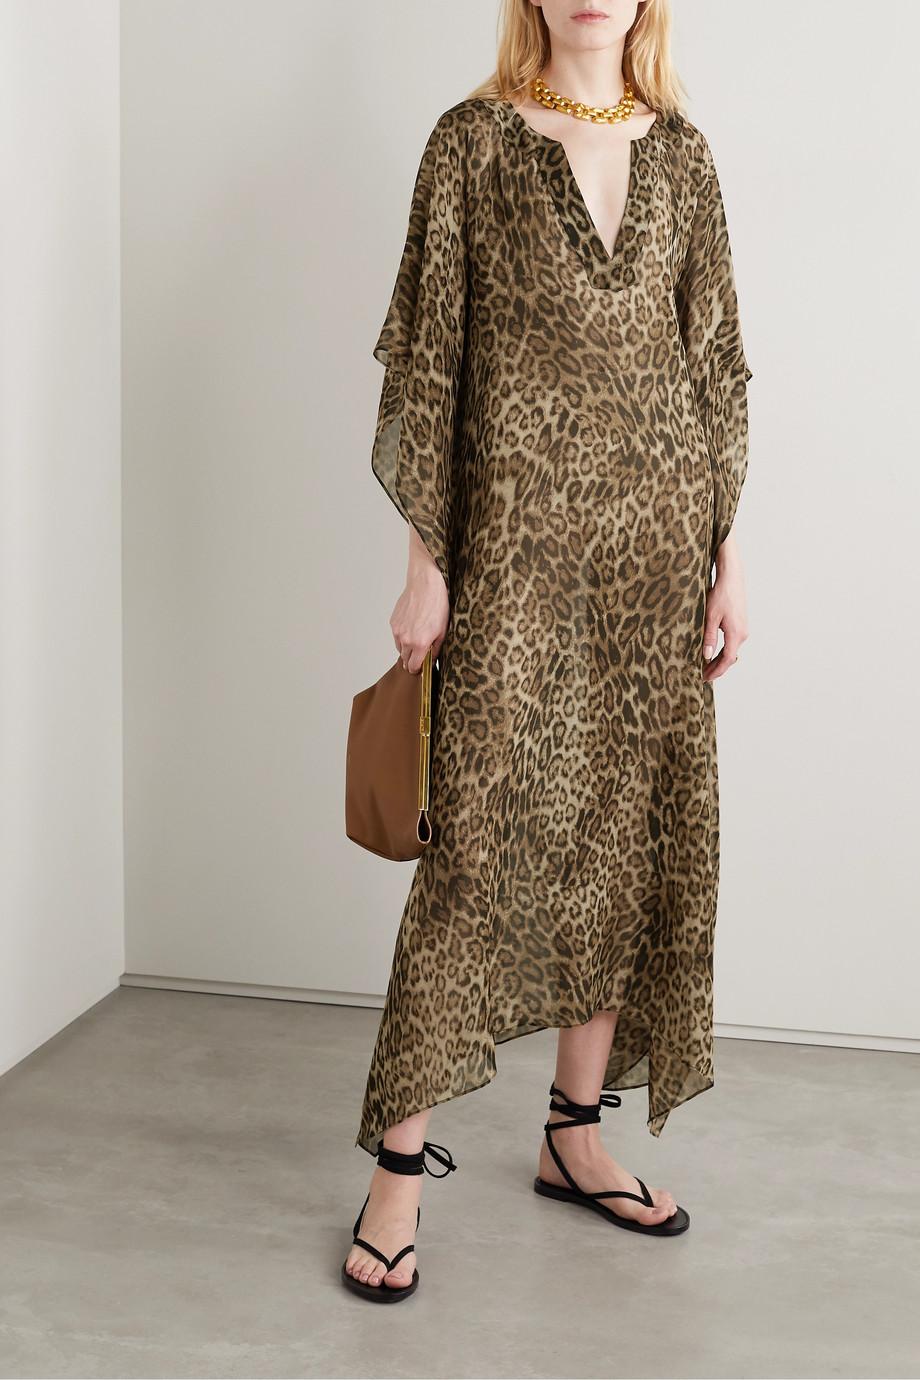 Nili Lotan Erica Kaftan aus Crêpe de Chine aus Seide mit Leopardenprint